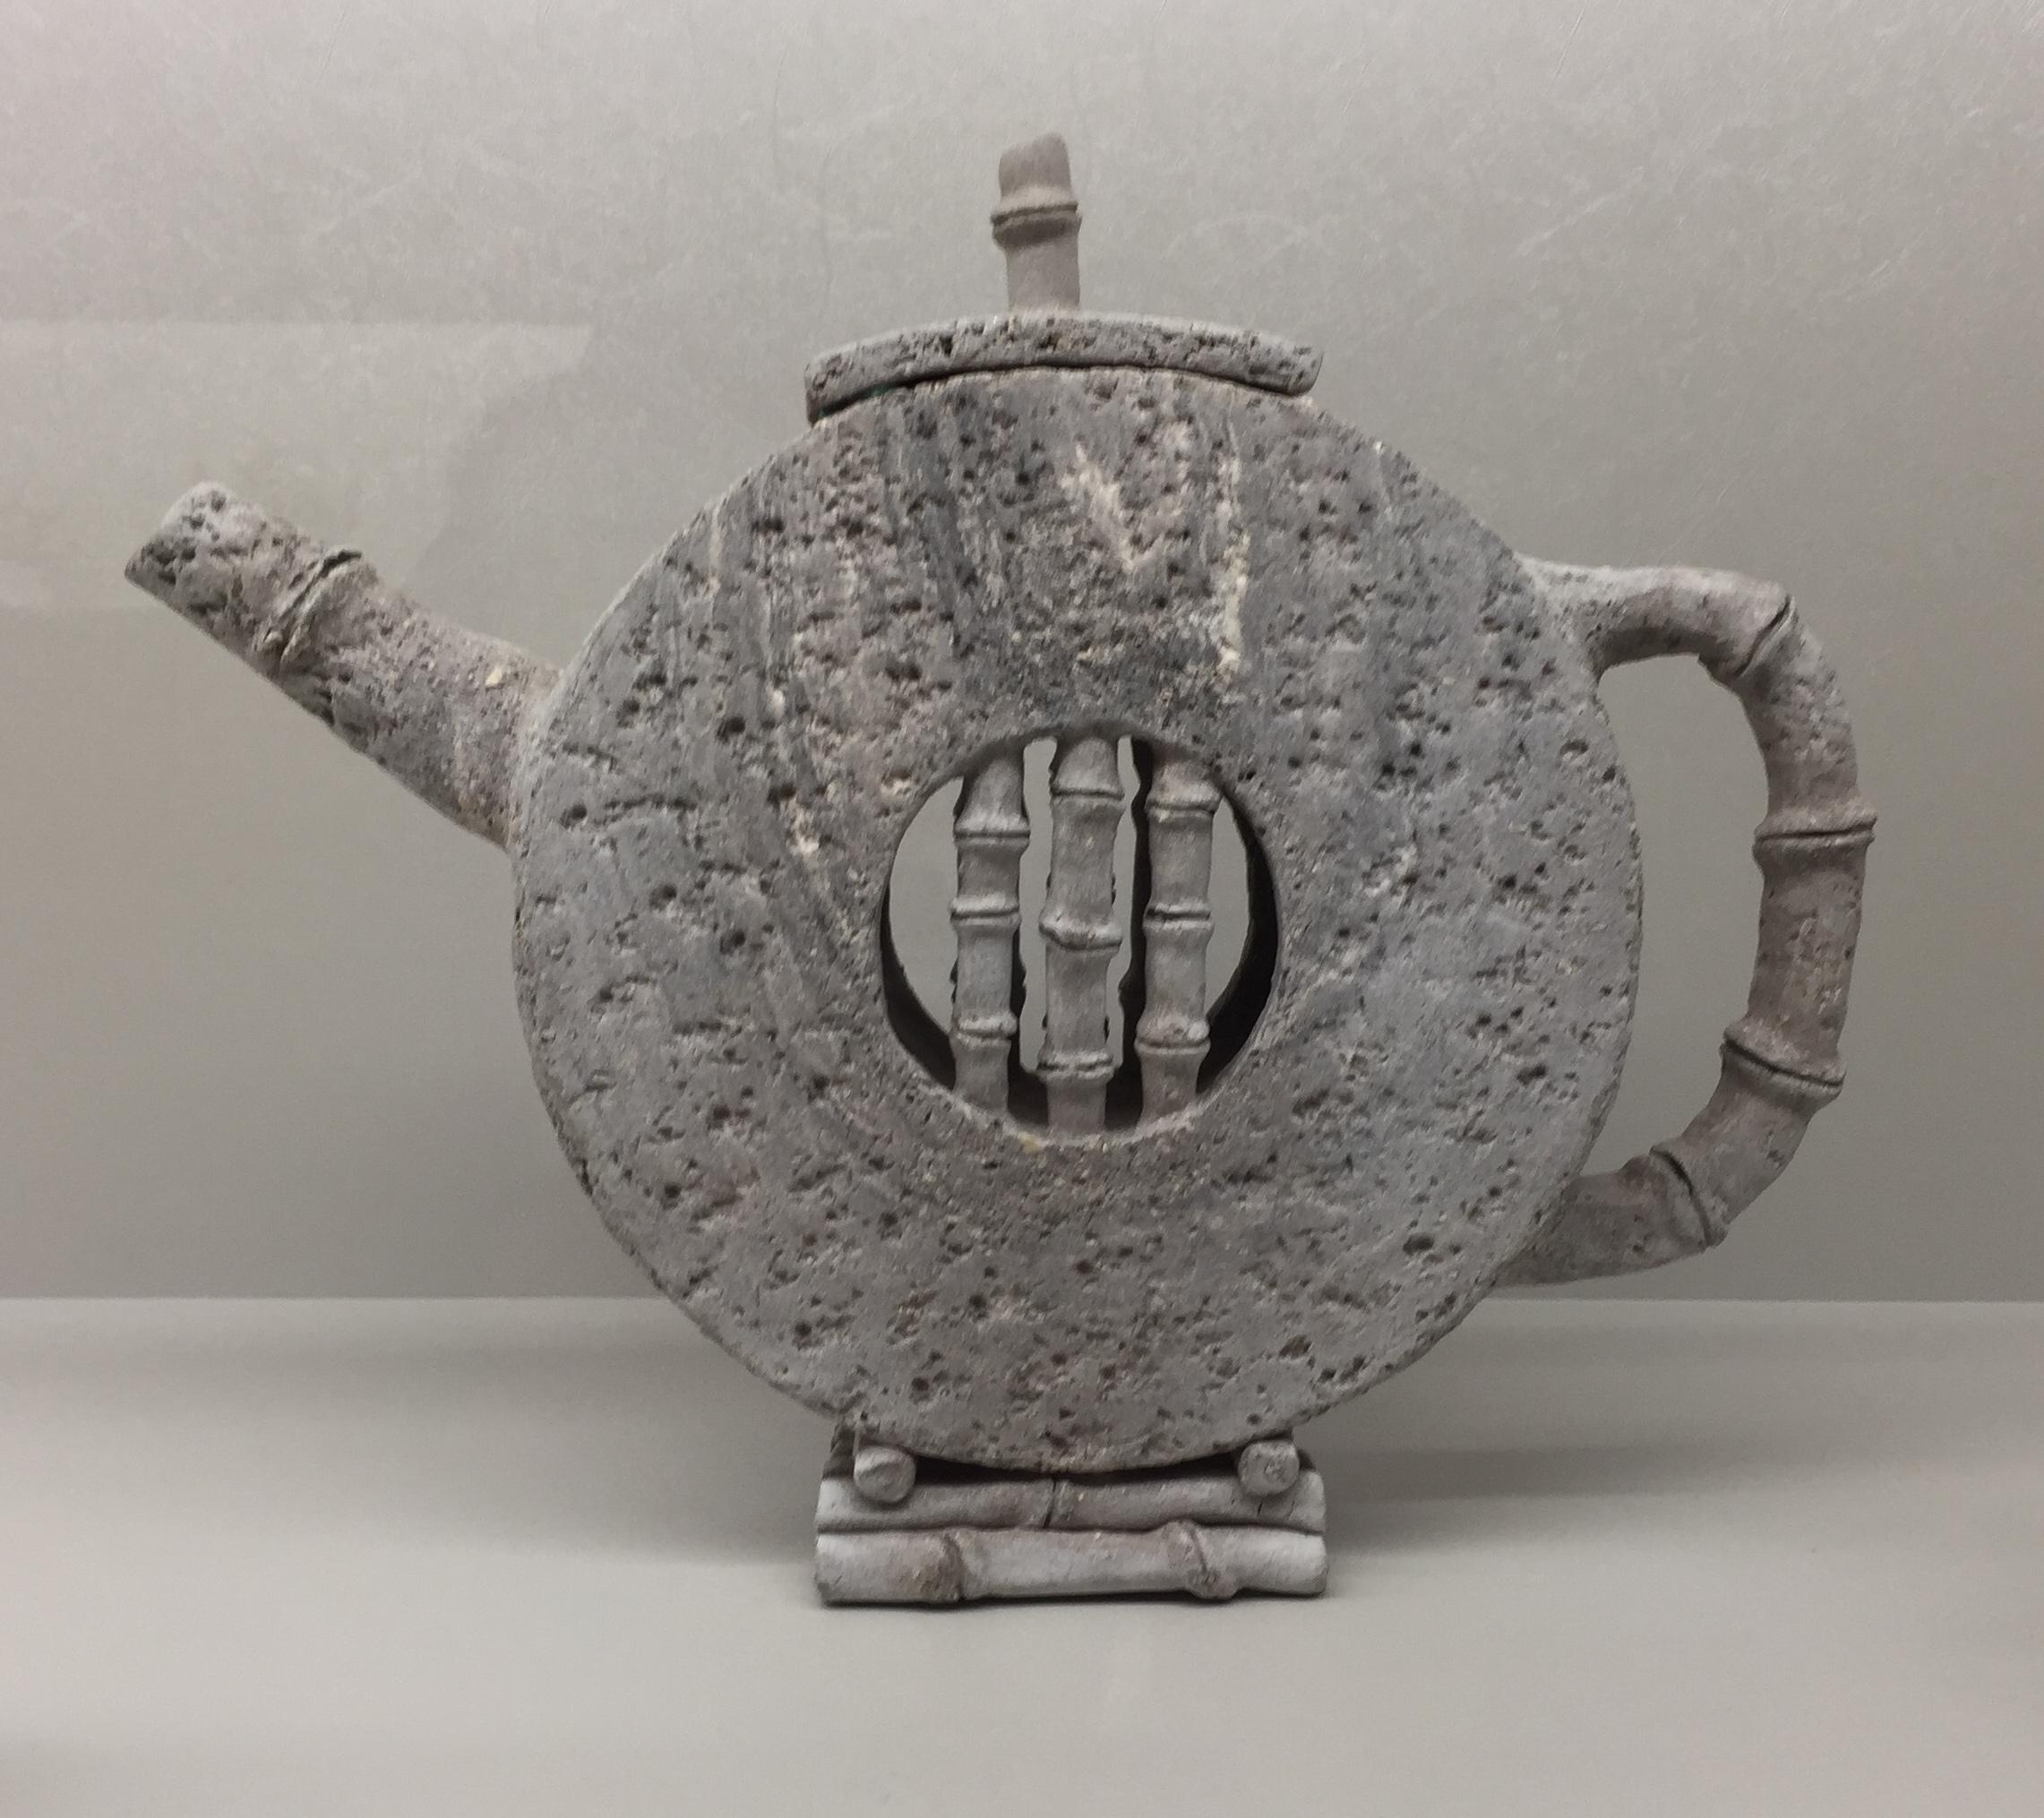 Evelyne Schoenmann's teapot! Congratulations!